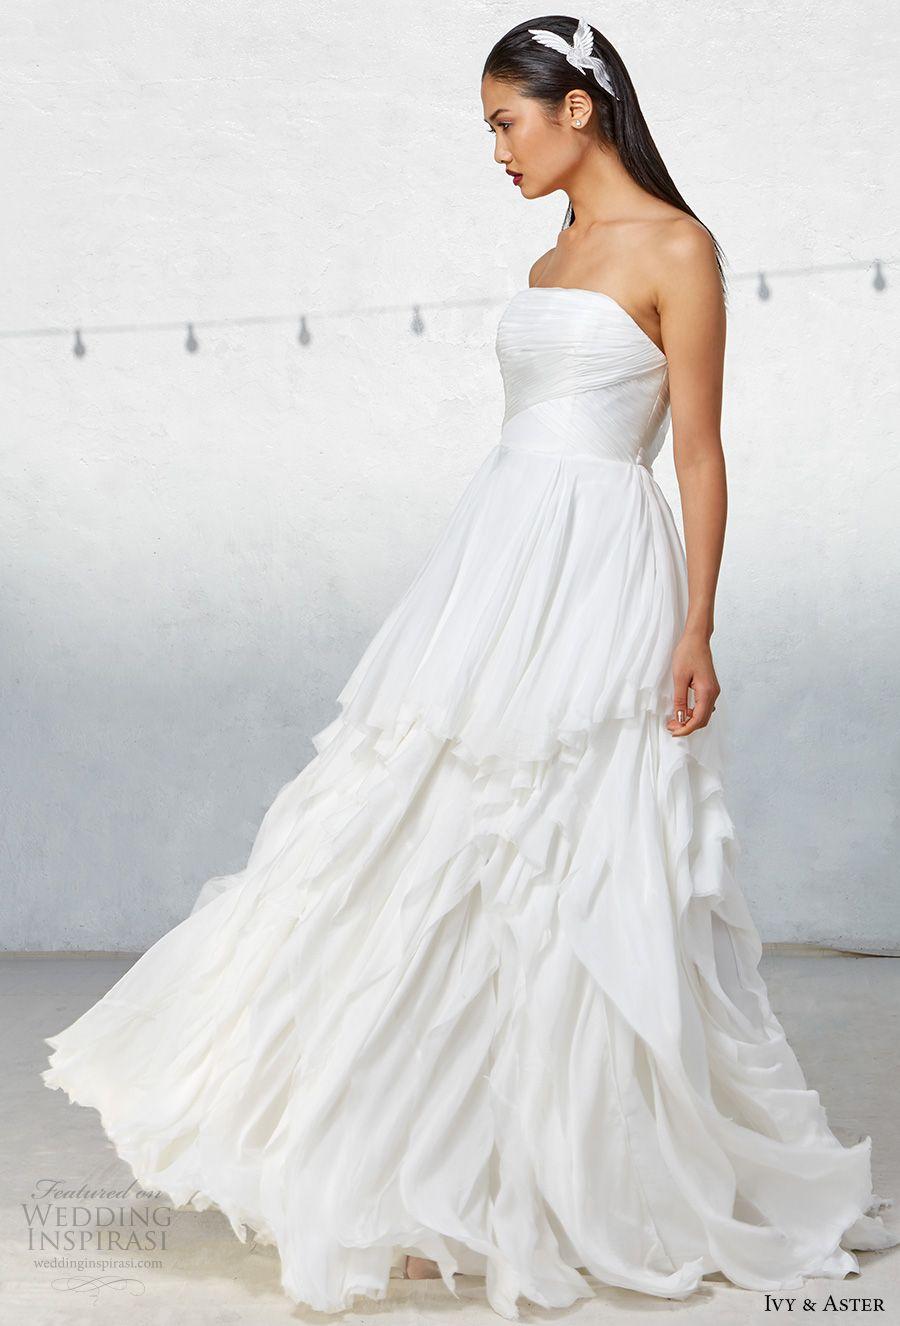 Ivy Aster Fall 2017 Wedding Dresses Wedding Inspirasi Ball Gown Wedding Dress Wedding Dresses Romantic Celtic Wedding Dress [ 1326 x 900 Pixel ]